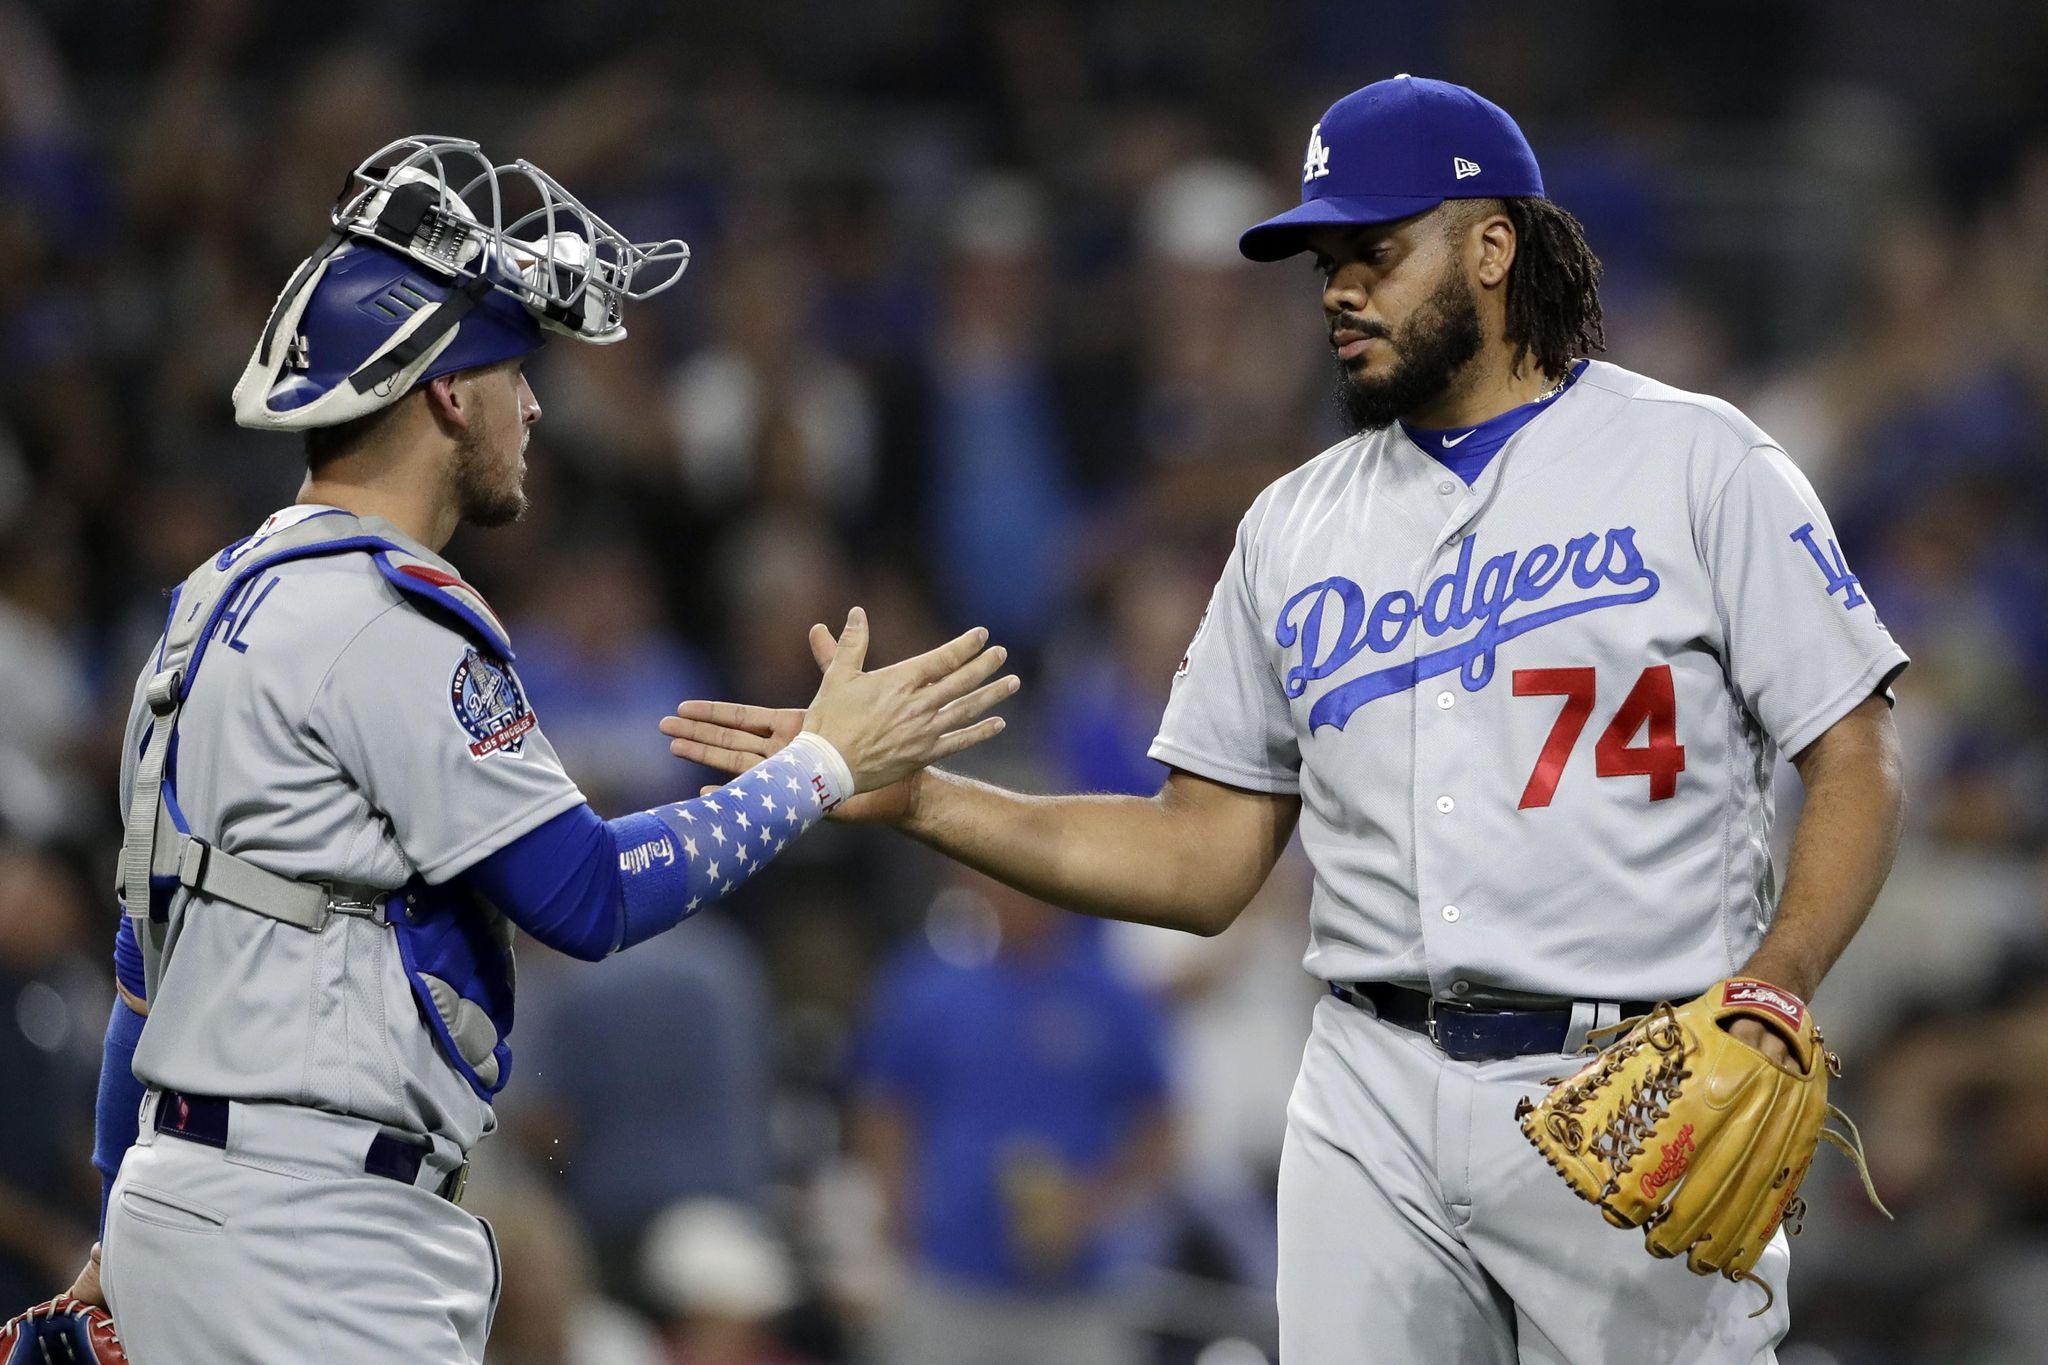 Dodgers_padres_baseball_38300_s2048x1365